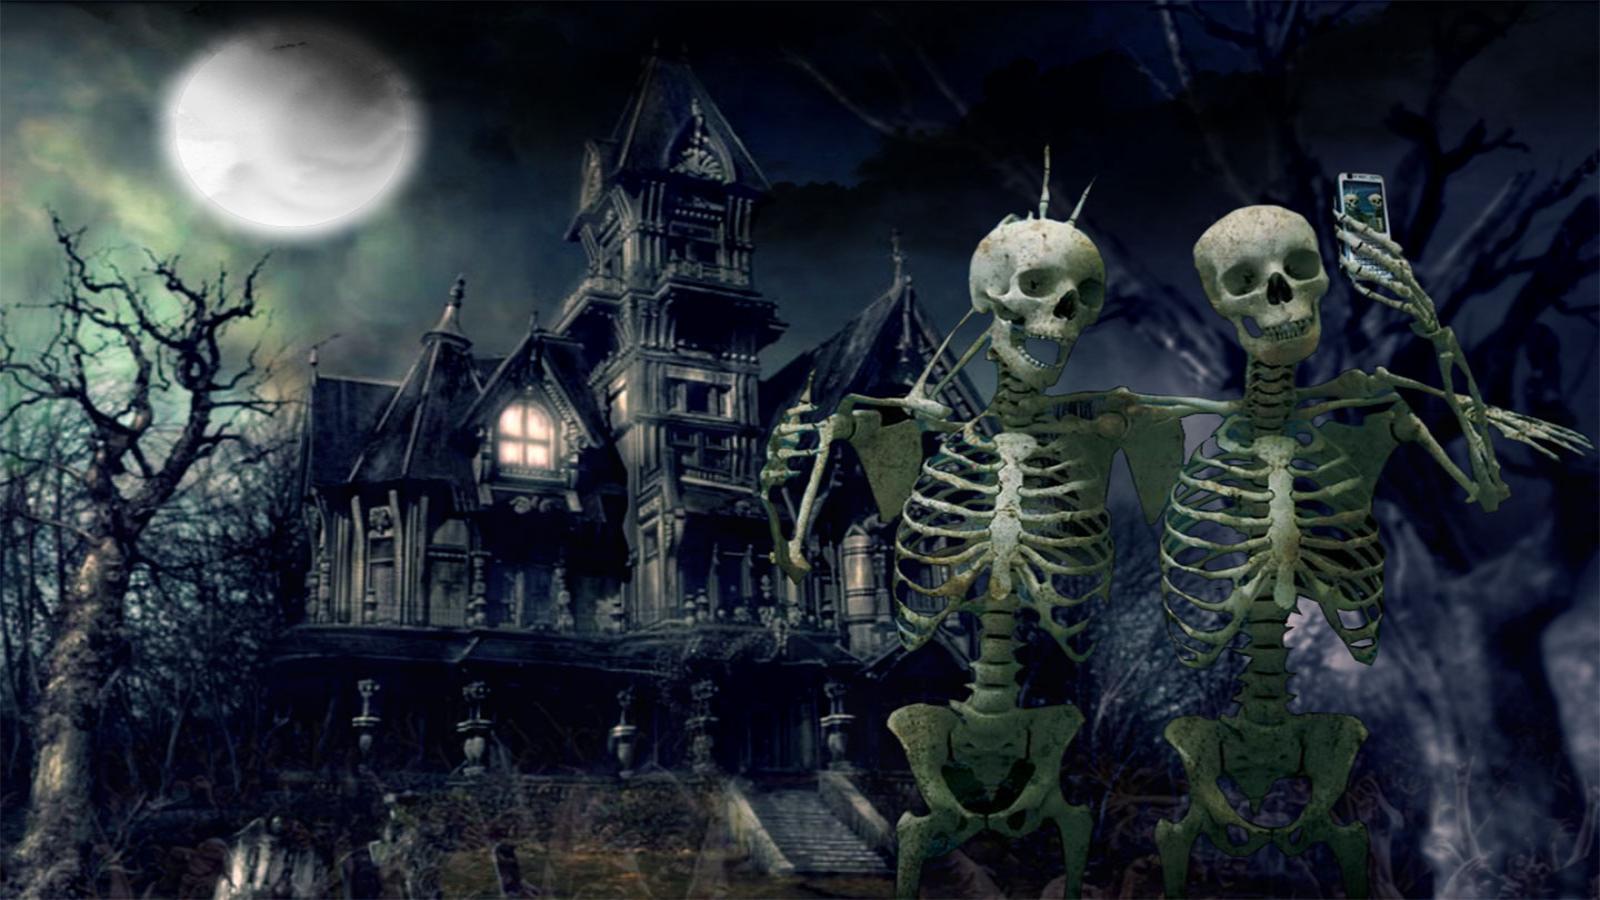 Scary Halloween Desktop Wallpaper HD wallpaper background 1600x900